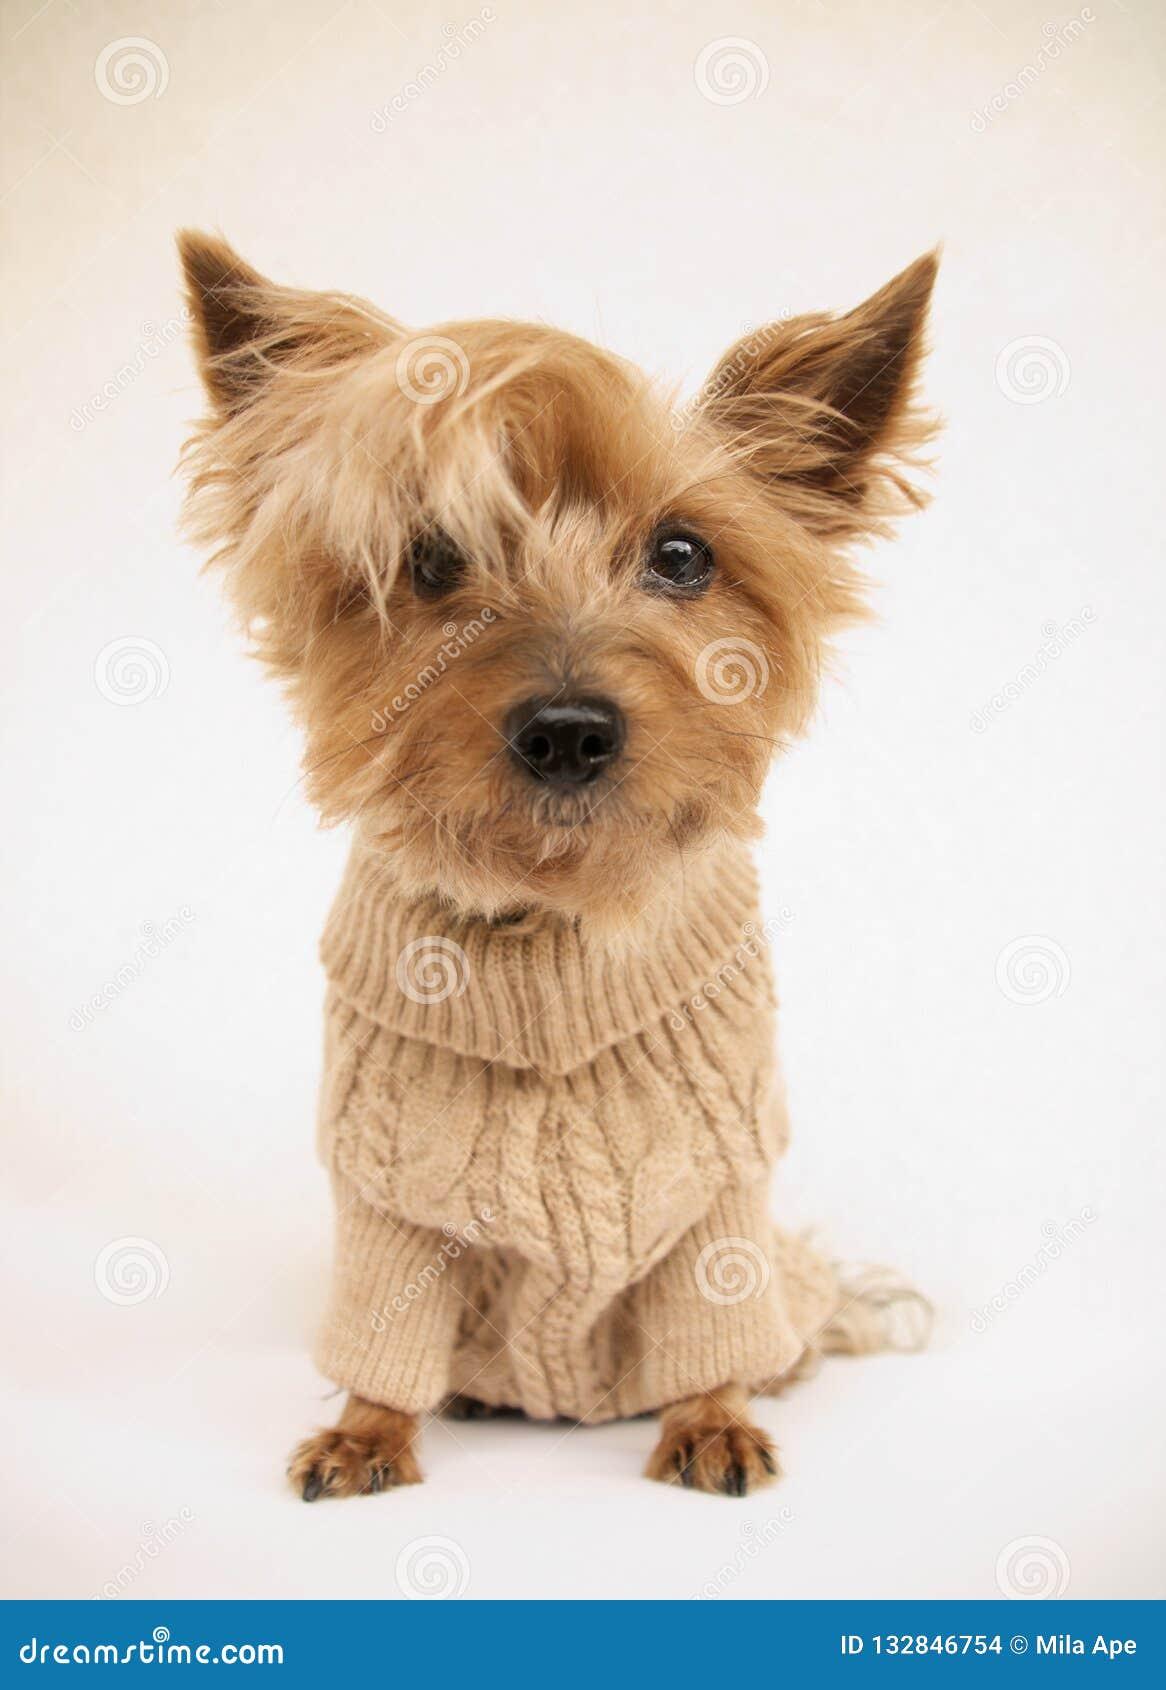 сладкий йоркширский терьер doggy